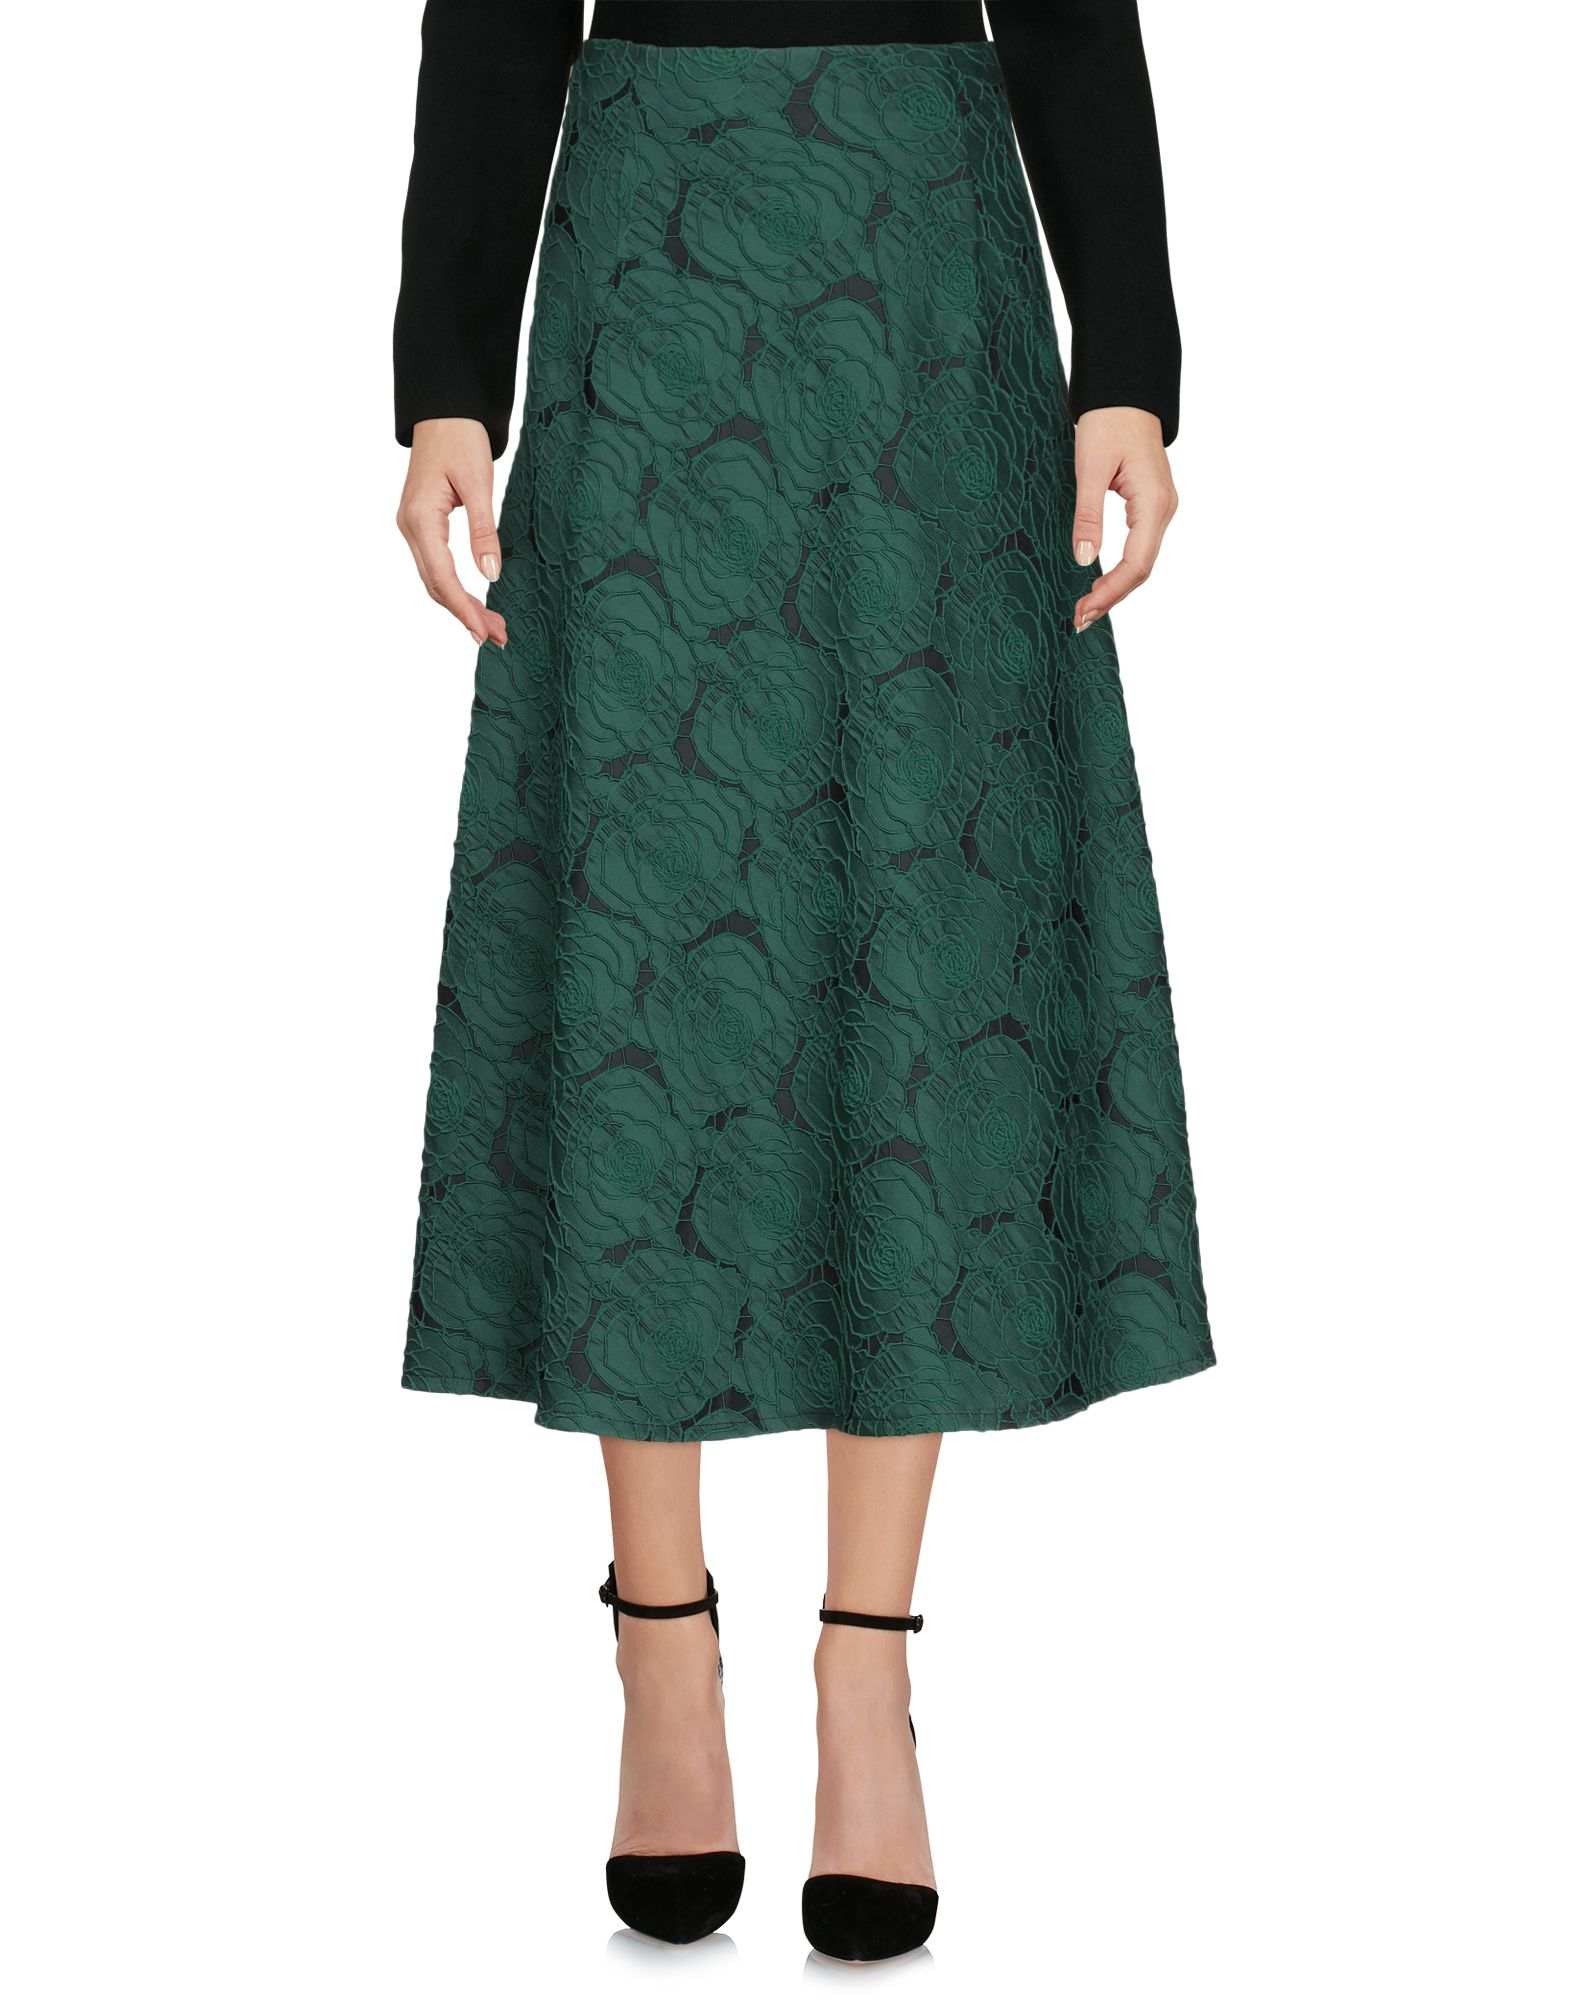 PAOLA PRATA Юбка длиной 3/4 moschino couture юбка длиной 3 4